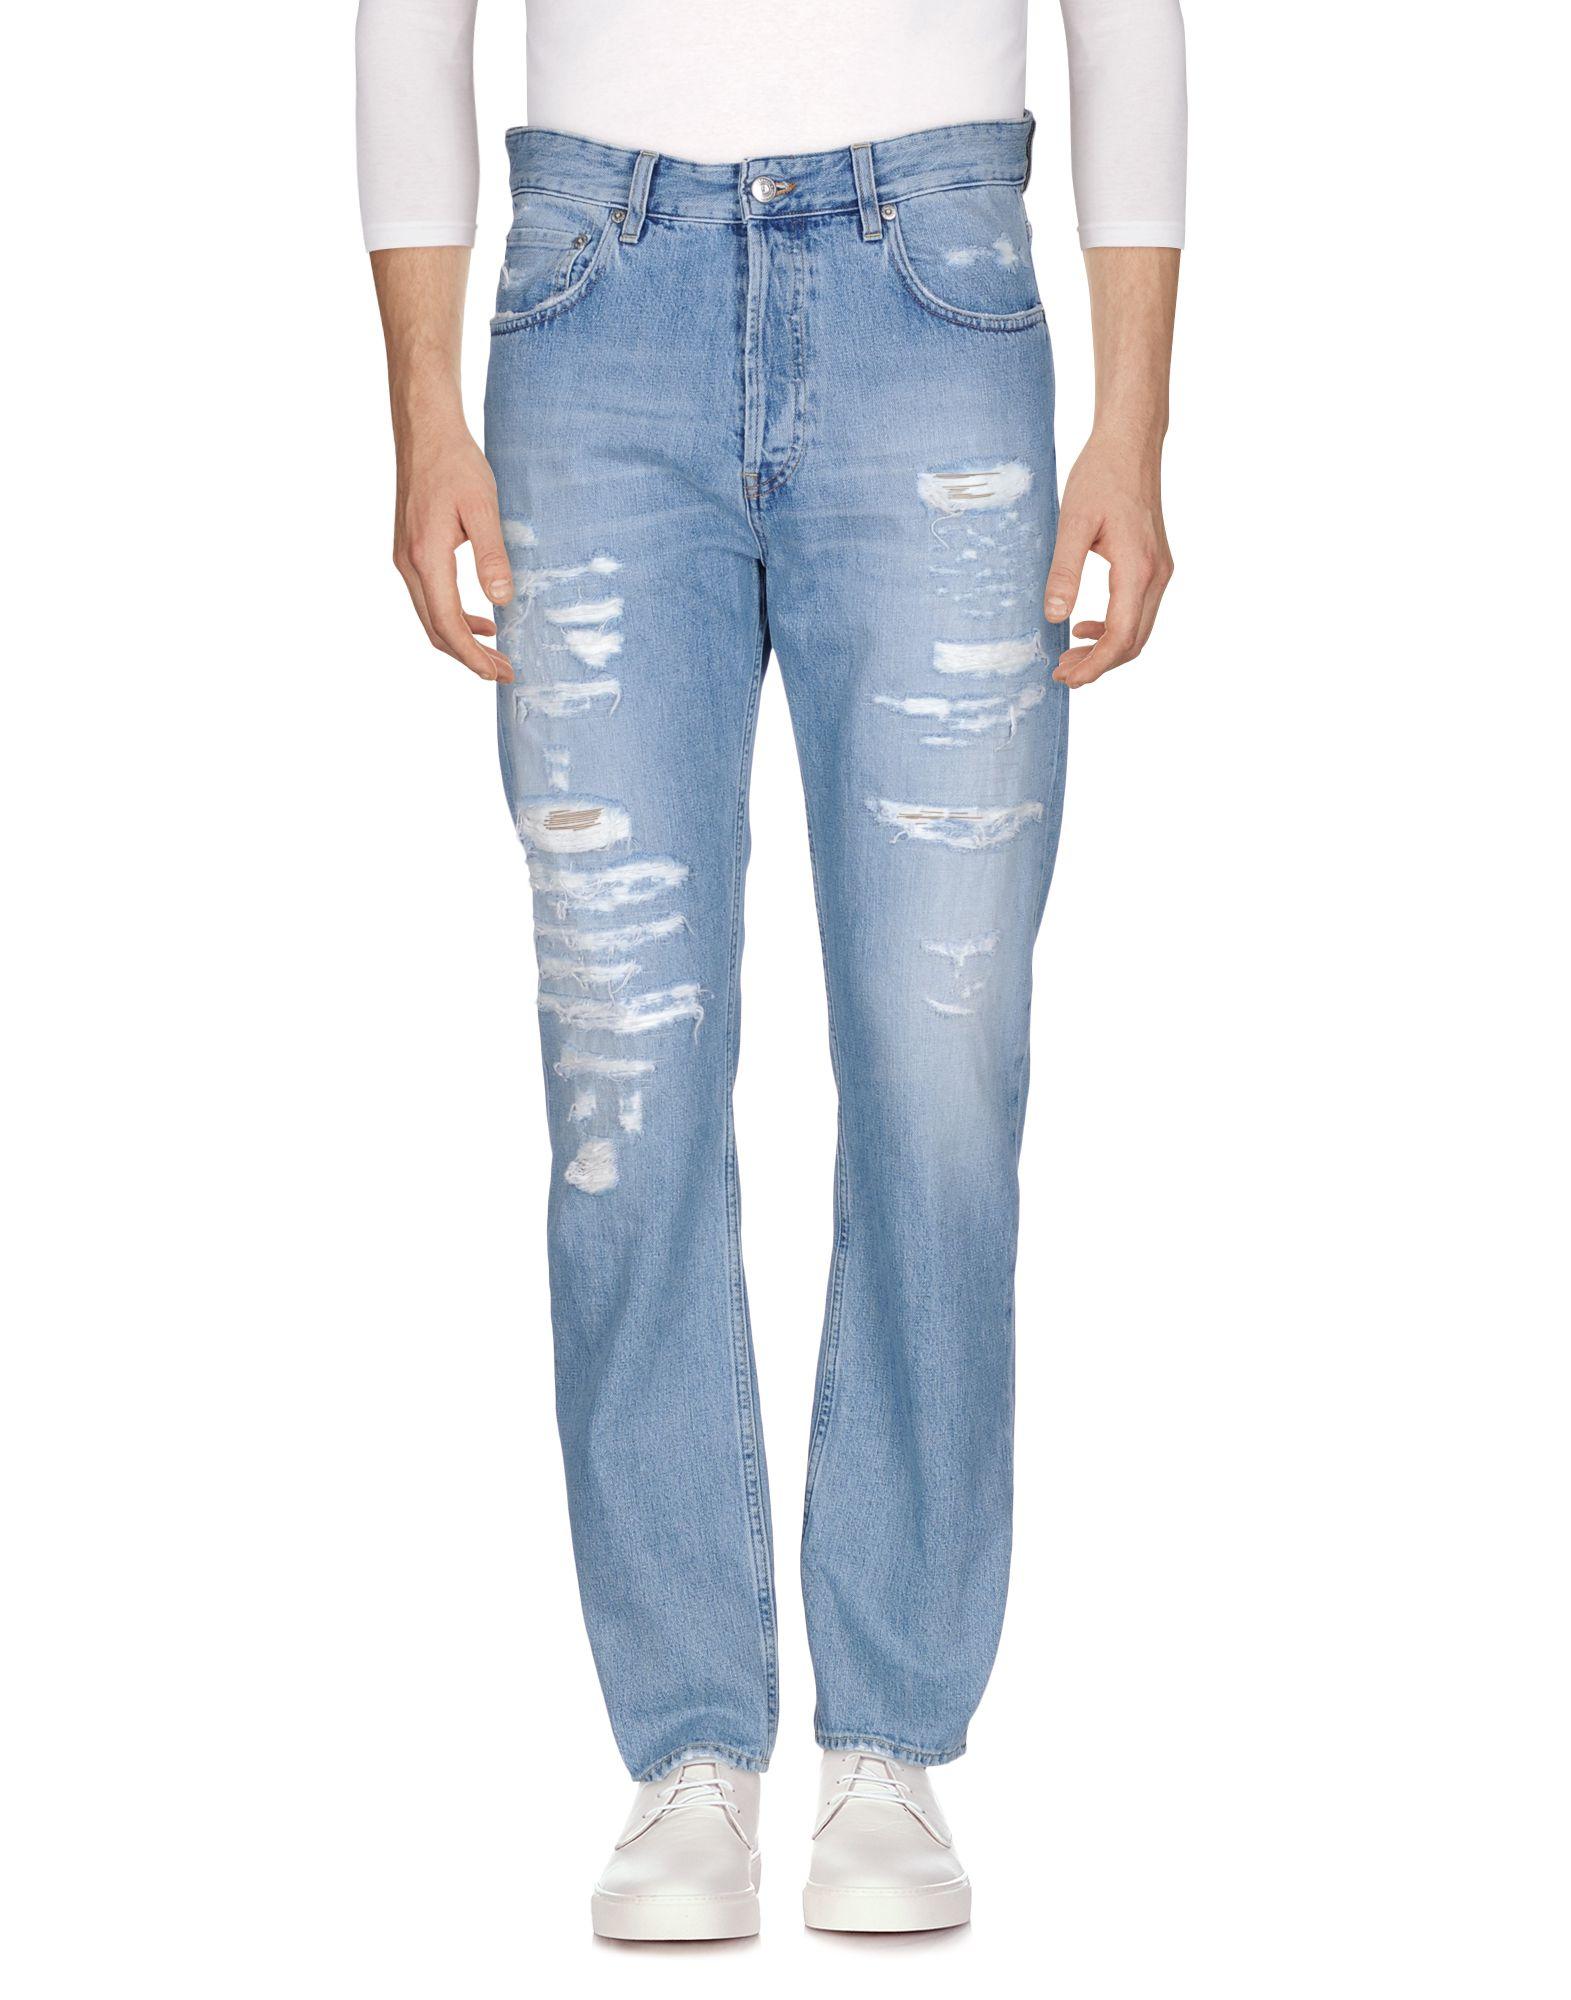 Pantaloni Jeans Department Department Jeans 5 Uomo - 42631969HB 4fdc1c